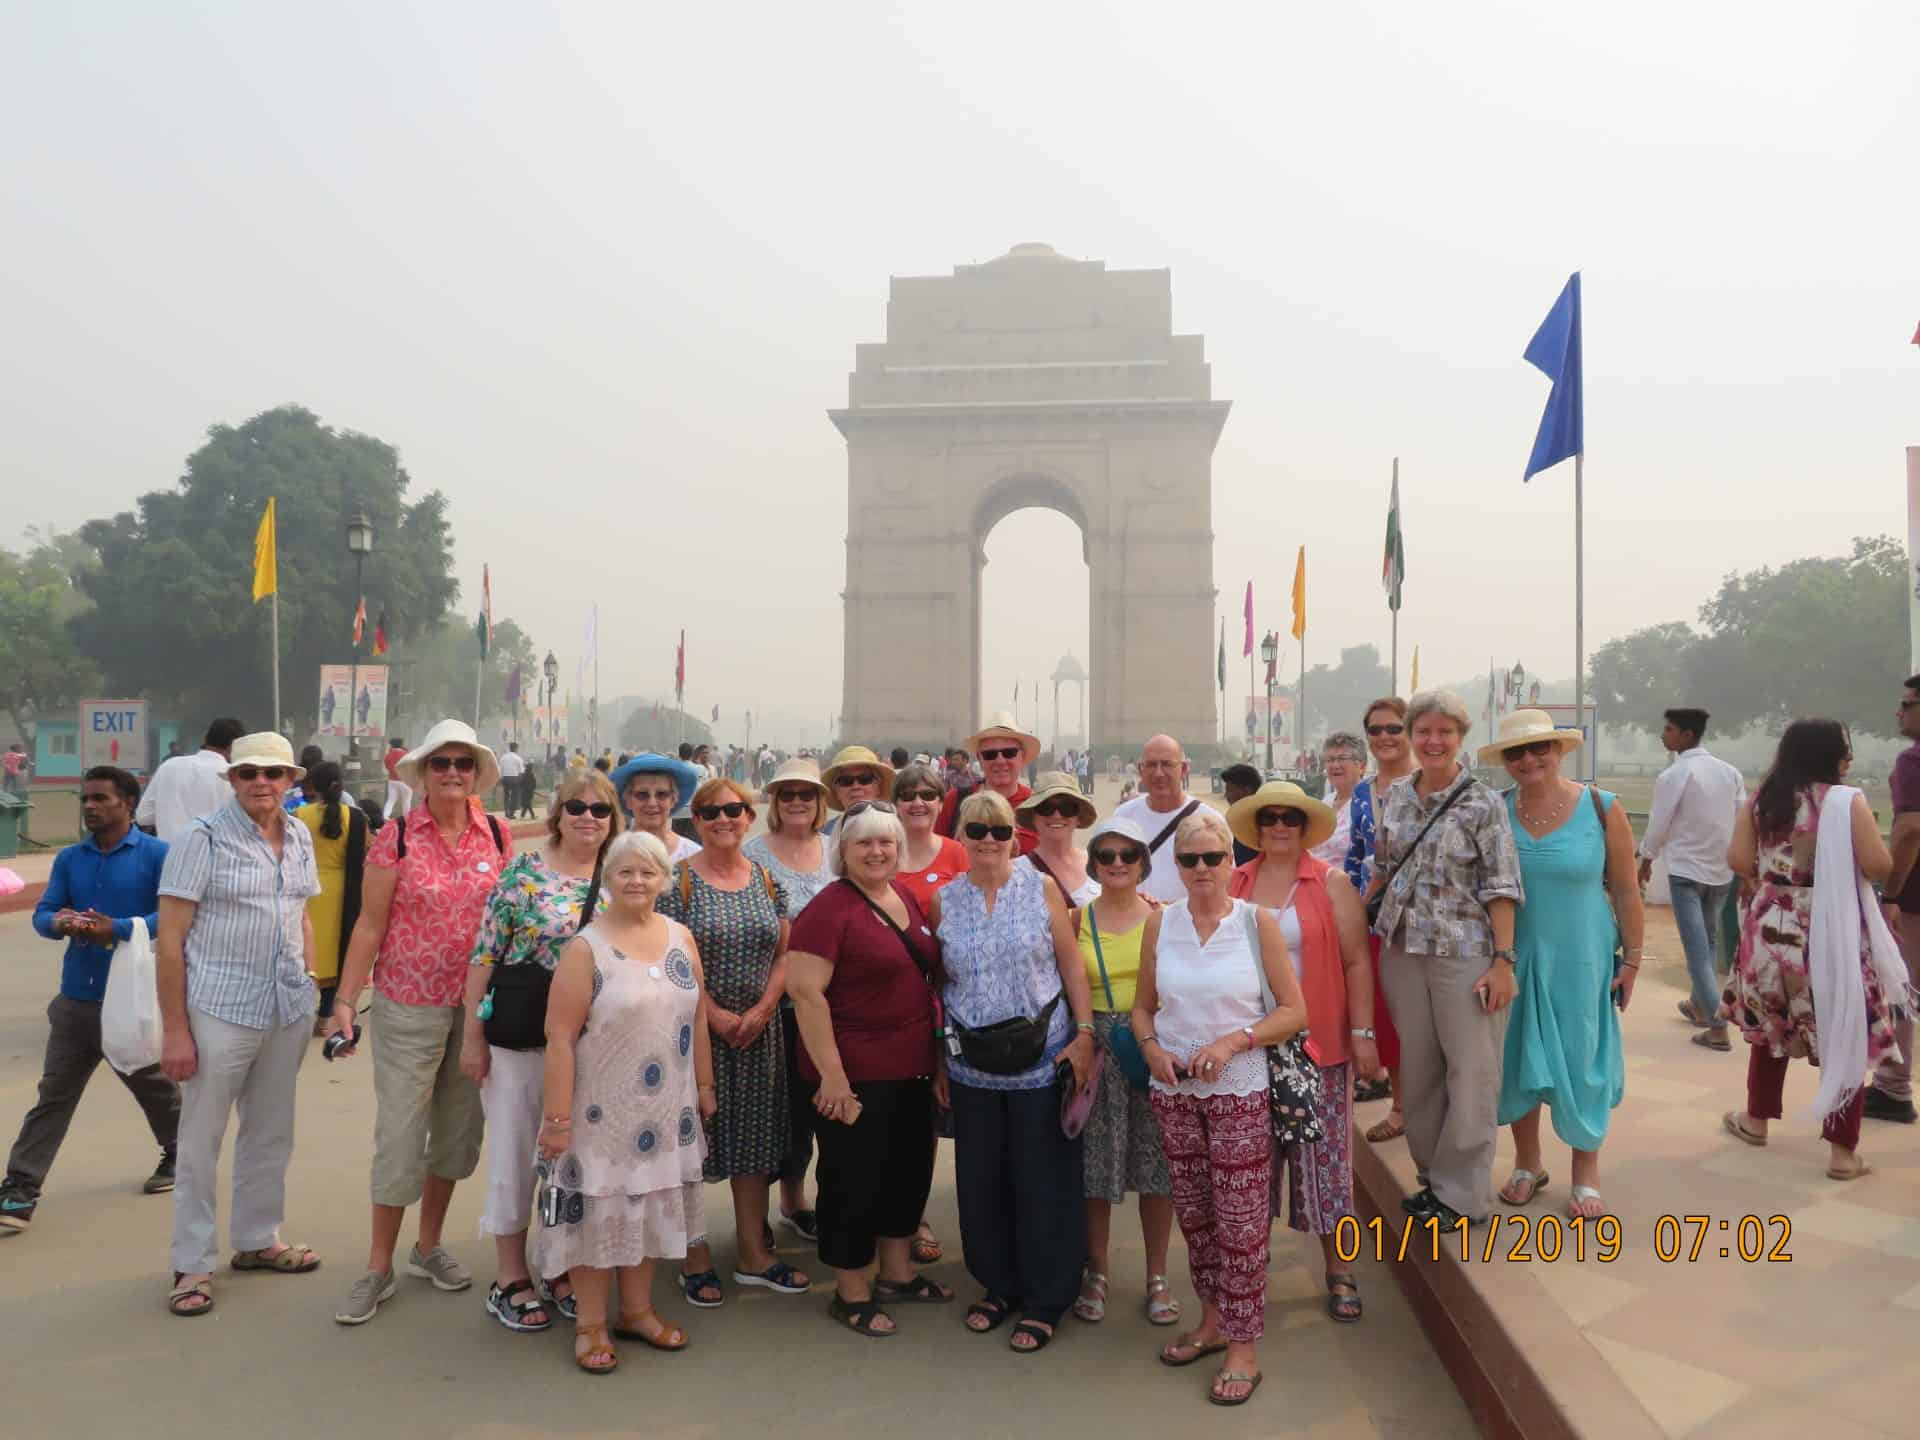 GRAND TOUR OF INDIA